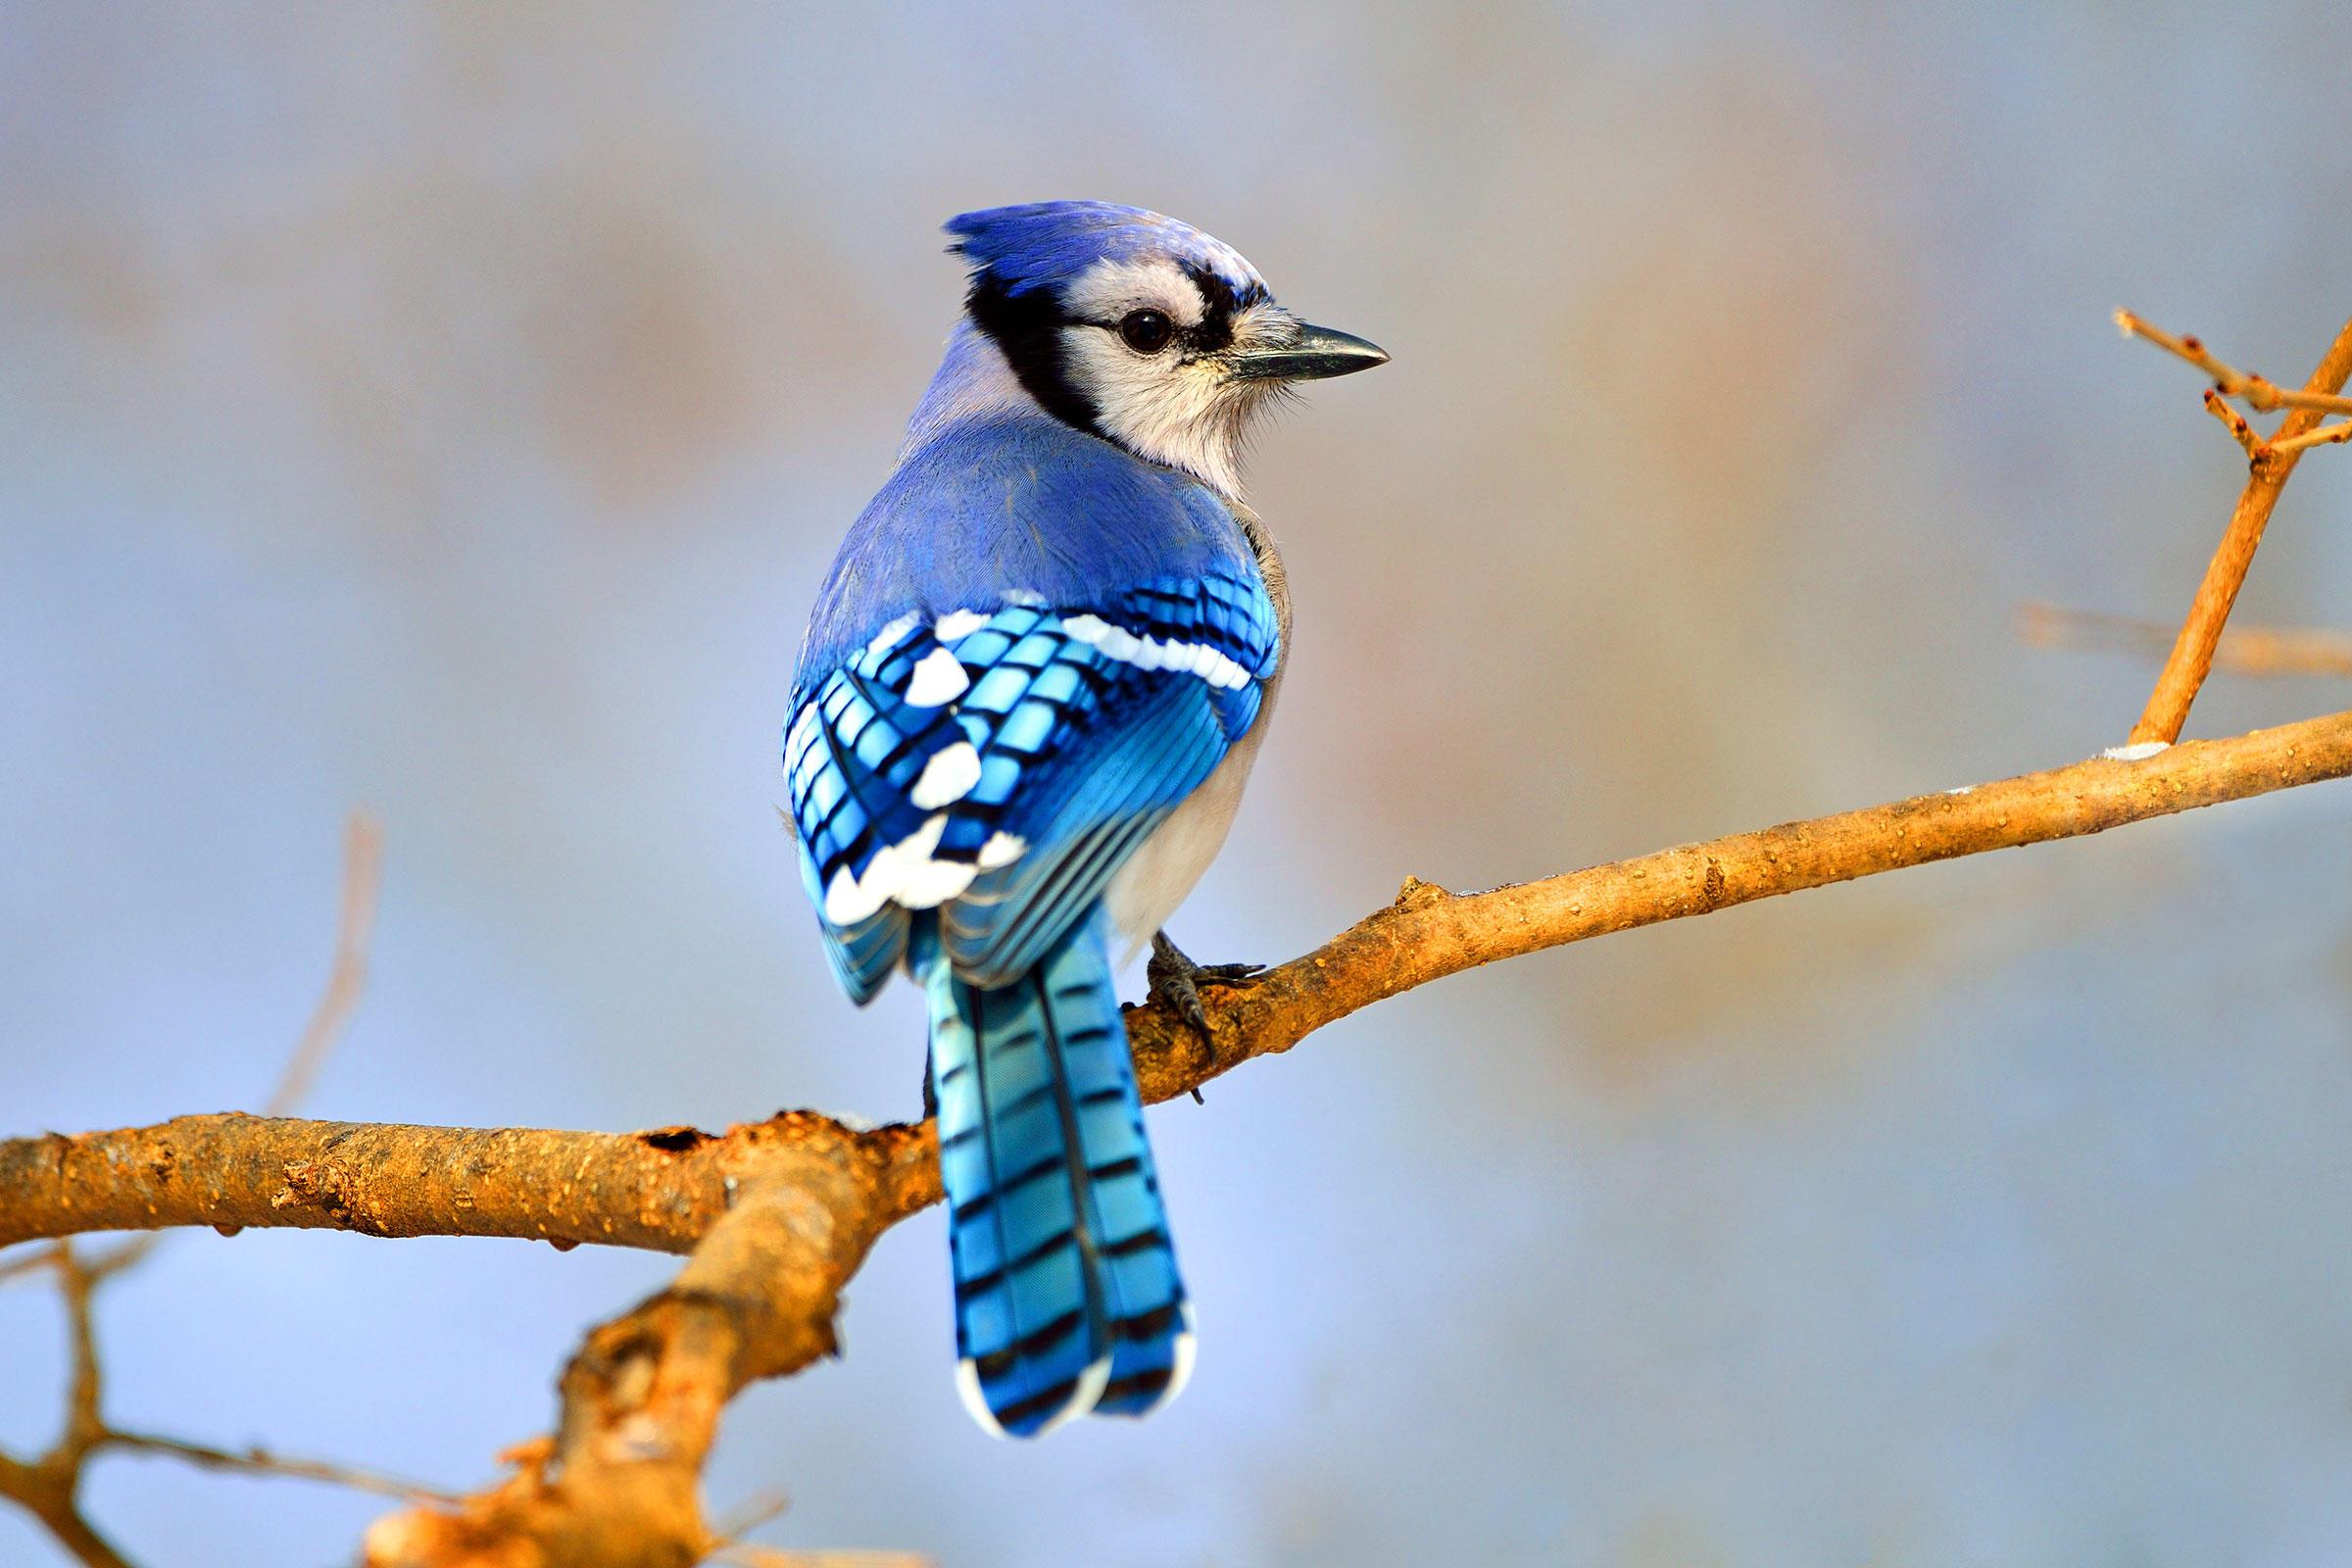 بالصور صور عصافير , اجمل صور عصافير ملونه 5696 8